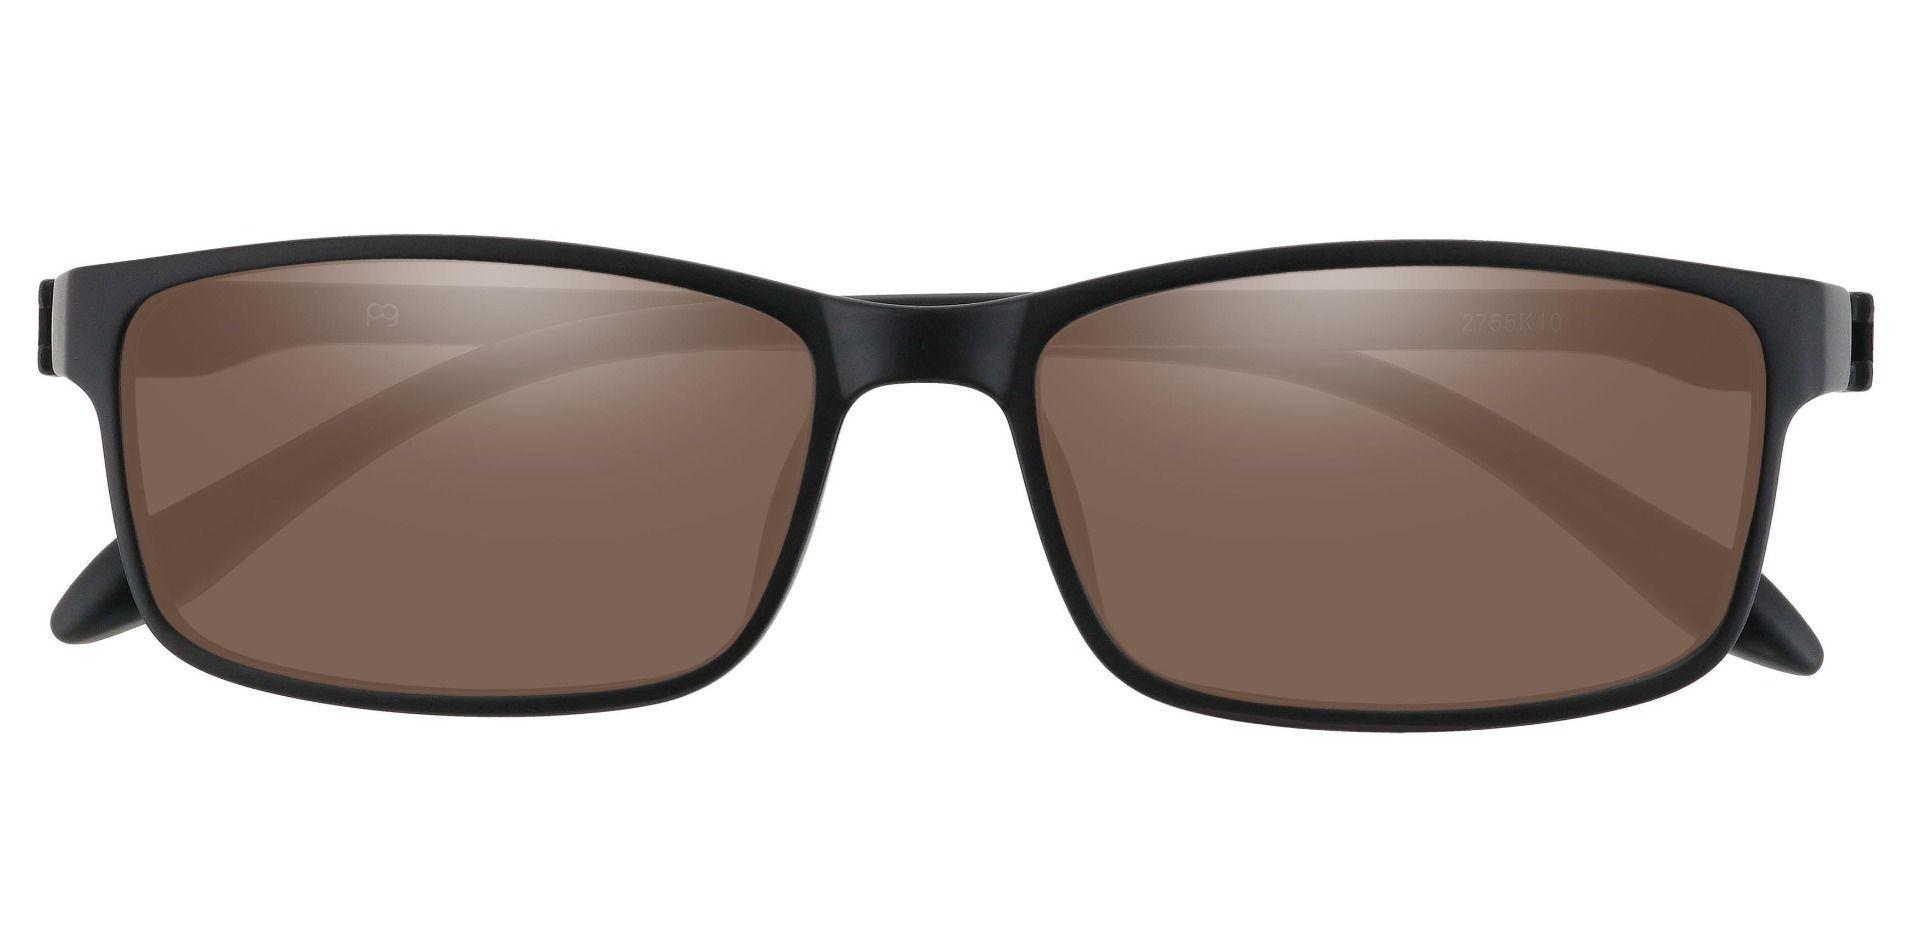 Candice Rectangle Prescription Sunglasses -  Black Frame With Brown Lenses